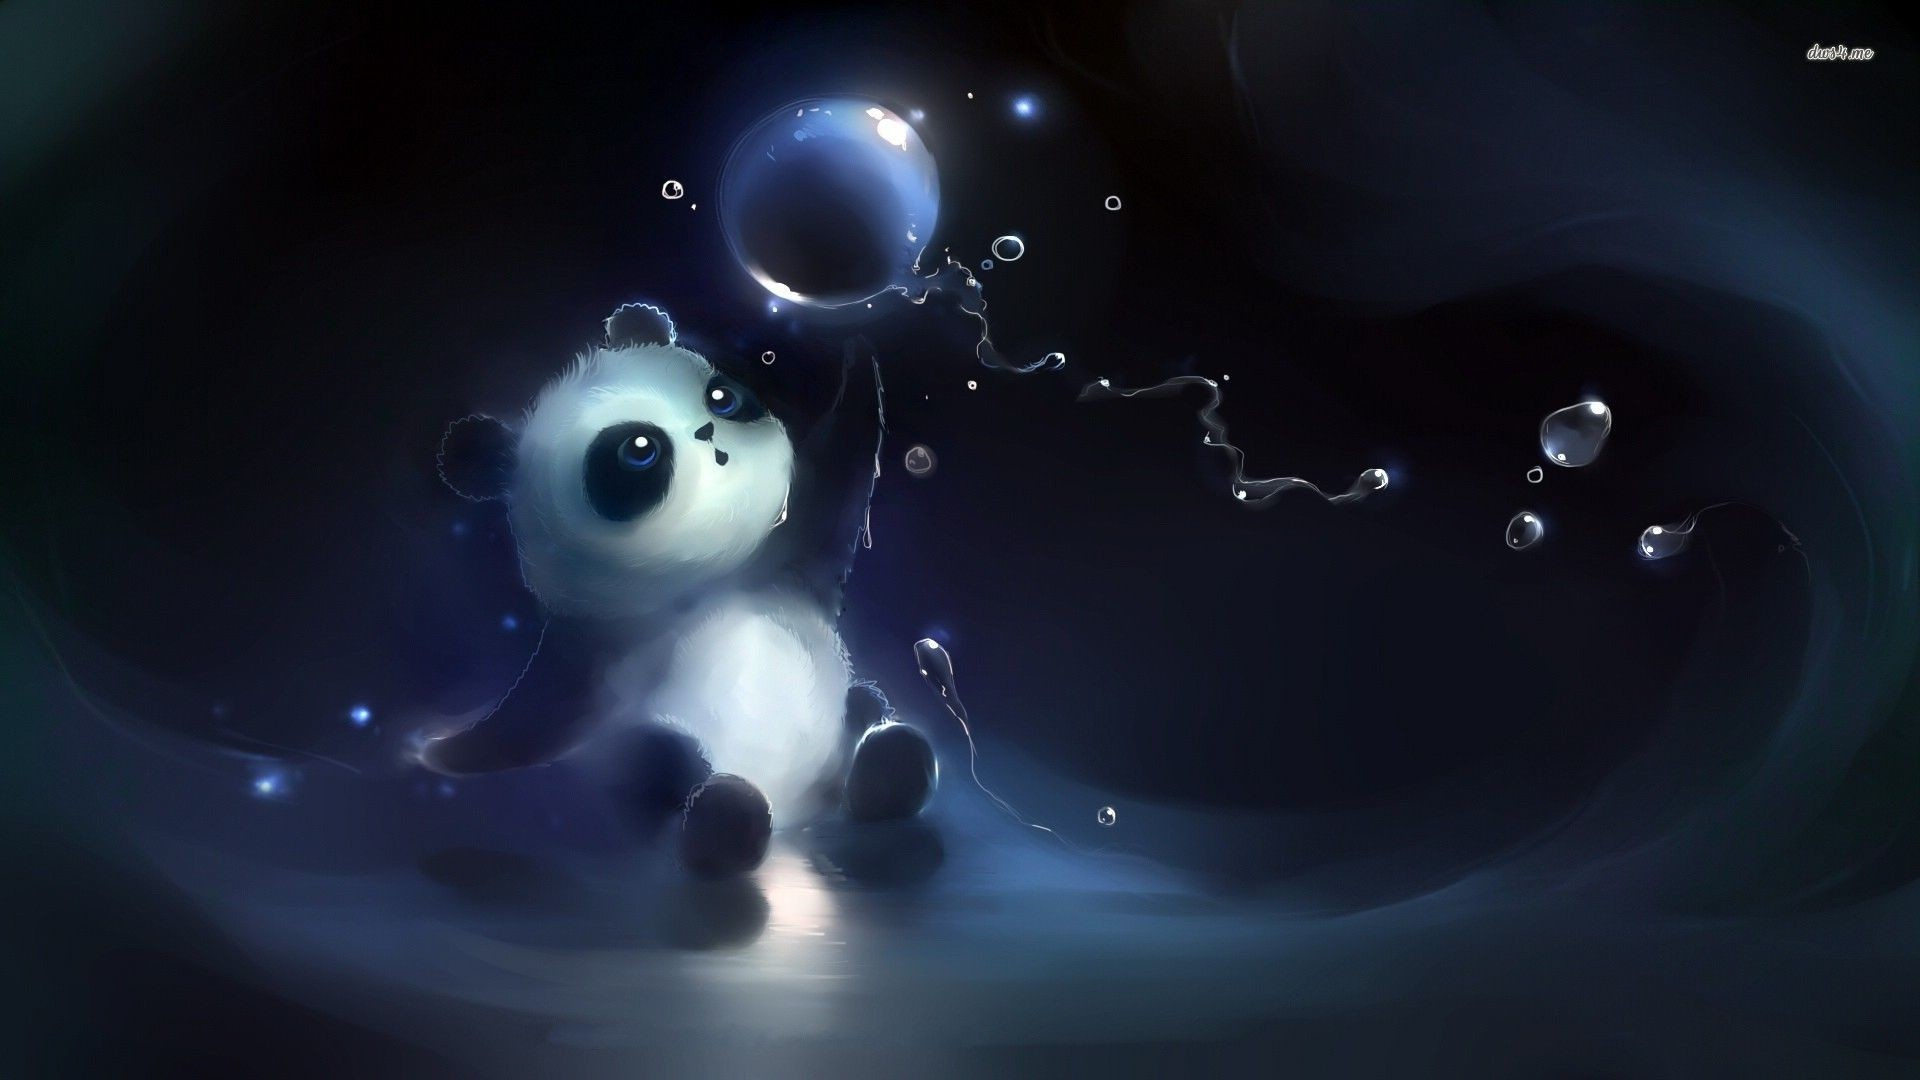 Res: 1920x1080, Anime Panda Desktop Wallpaper 07550 - Baltana